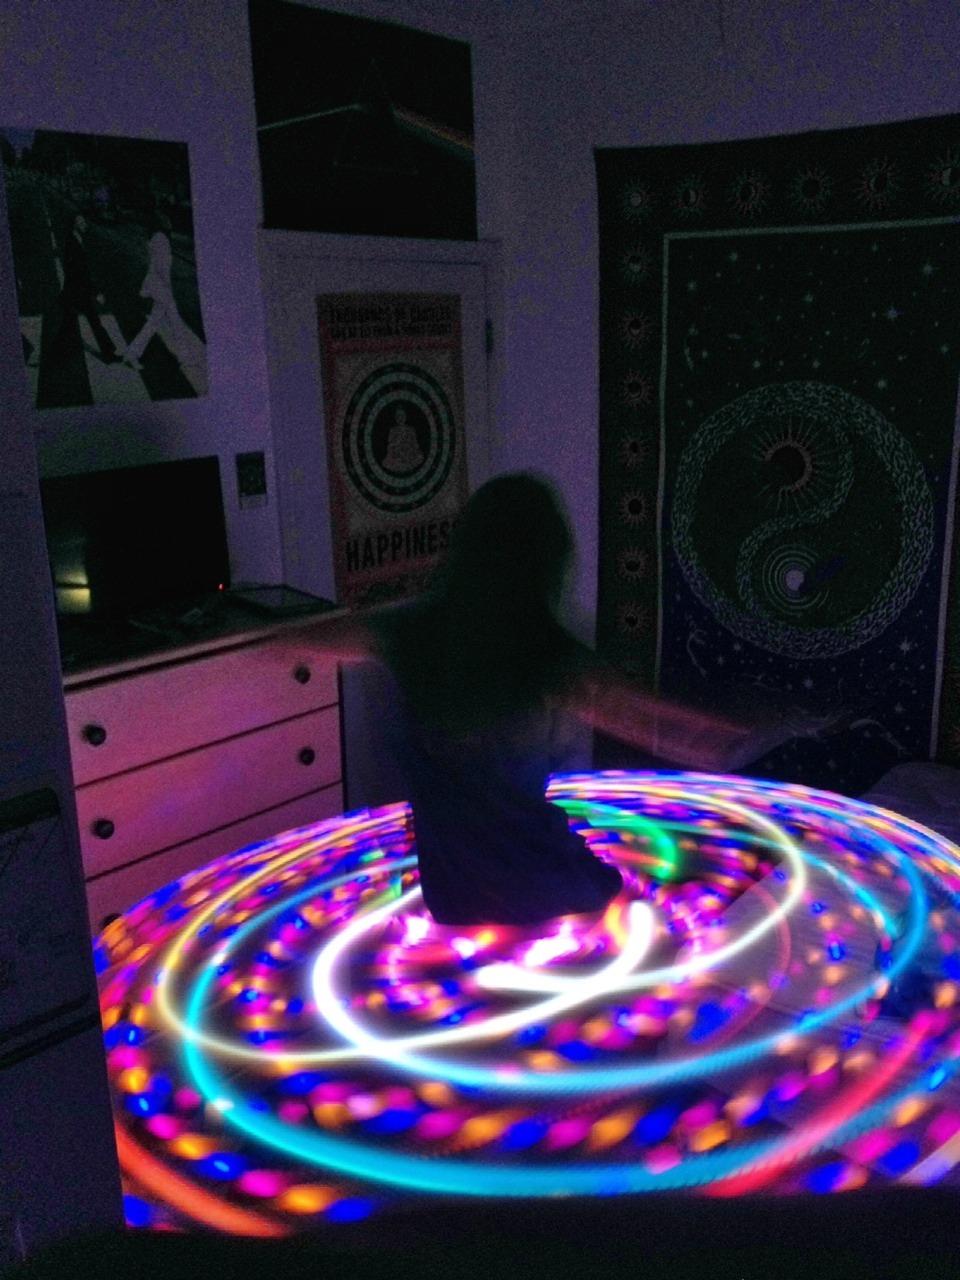 Moodhoops Blazemadzbrown:I love my hoop